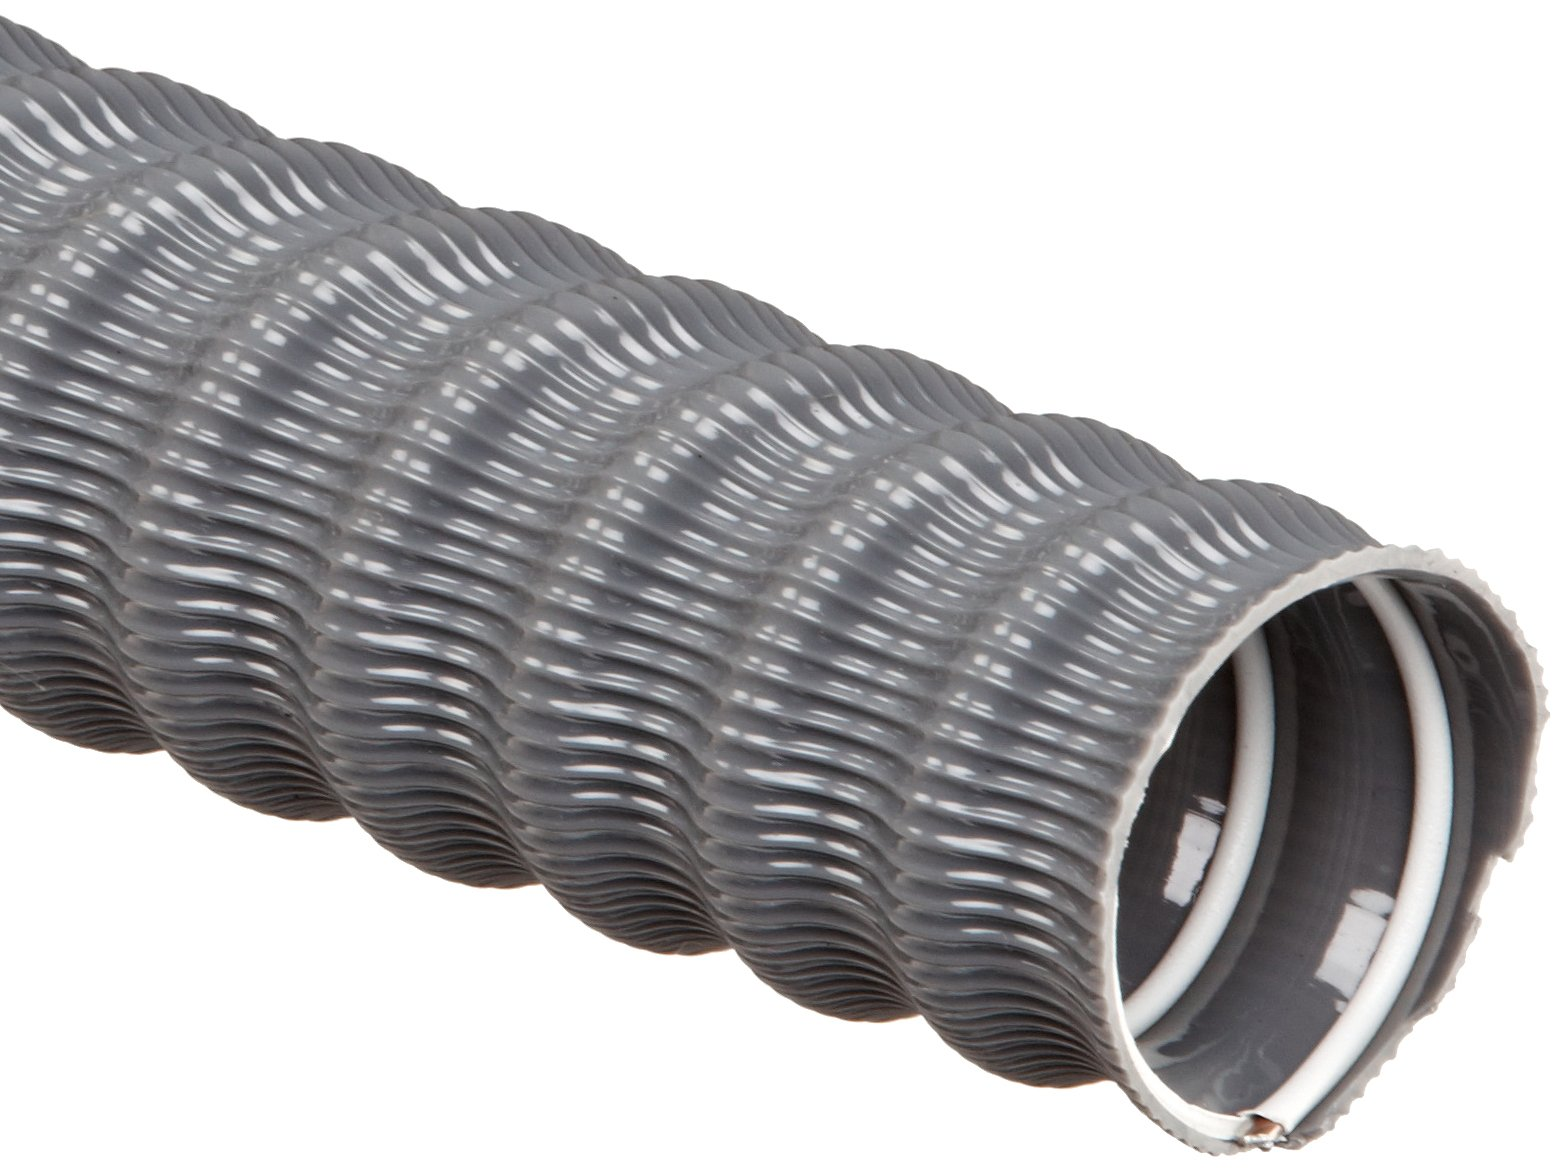 Dayflex MG-V PVC Duct Hose, Gray, 1.50'' ID, 50' Length